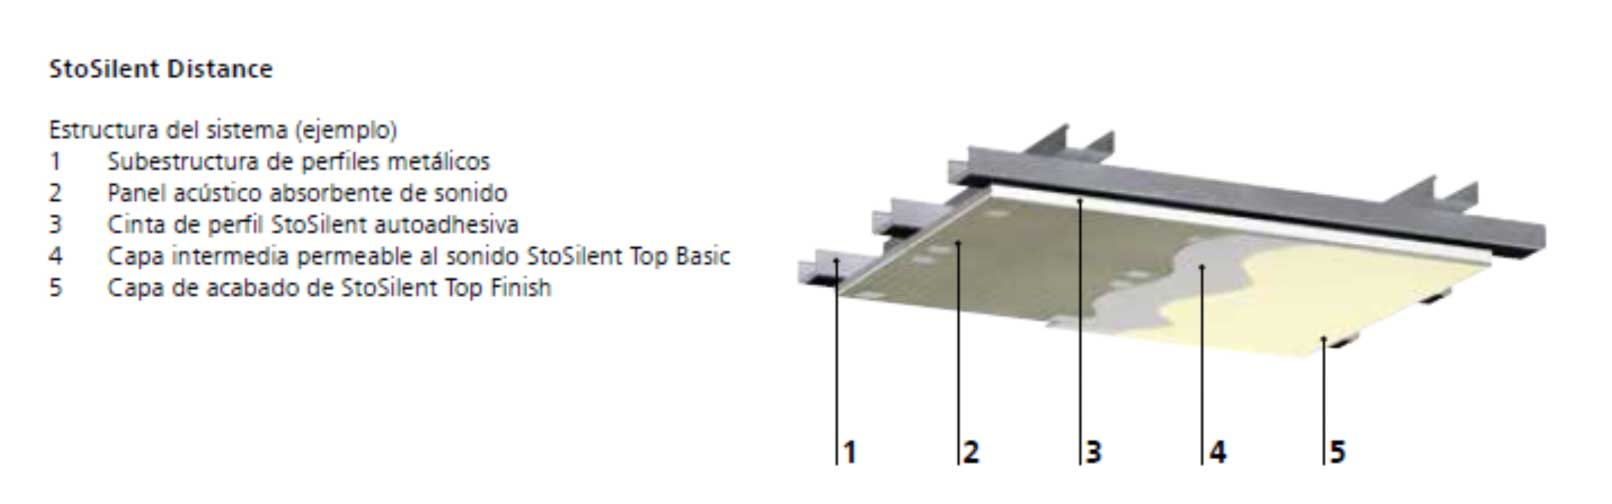 Techo acústico StoSilent Distance 100